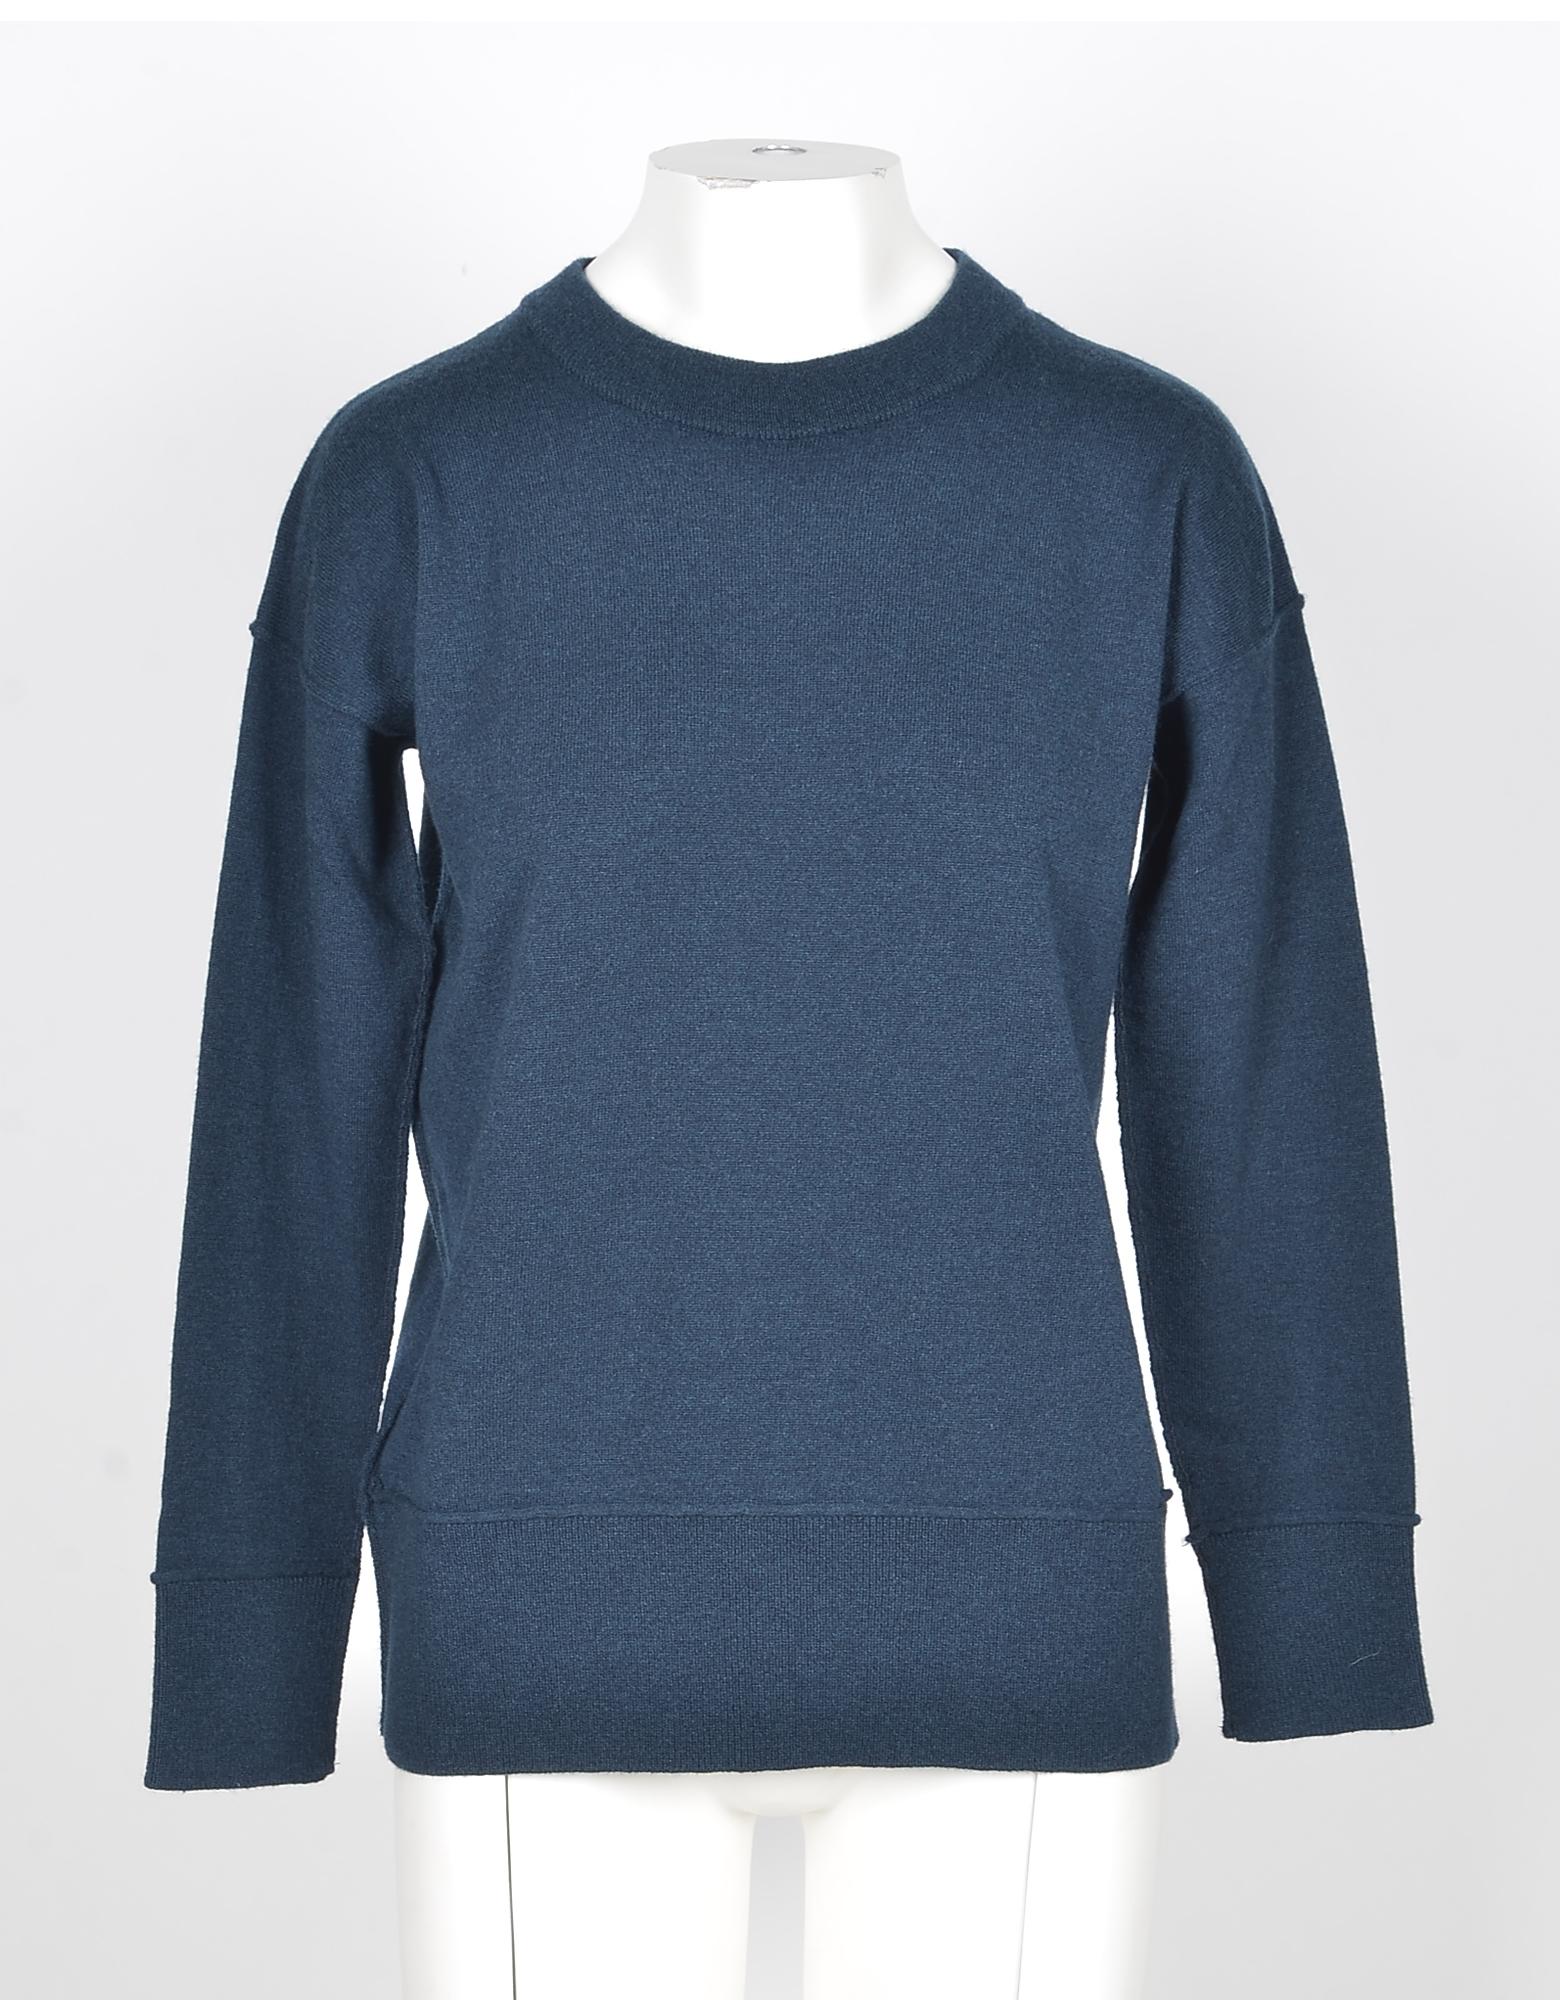 Alpha Studio Designer Knitwear, Blue Wool and Cashmere Women's Sweater'